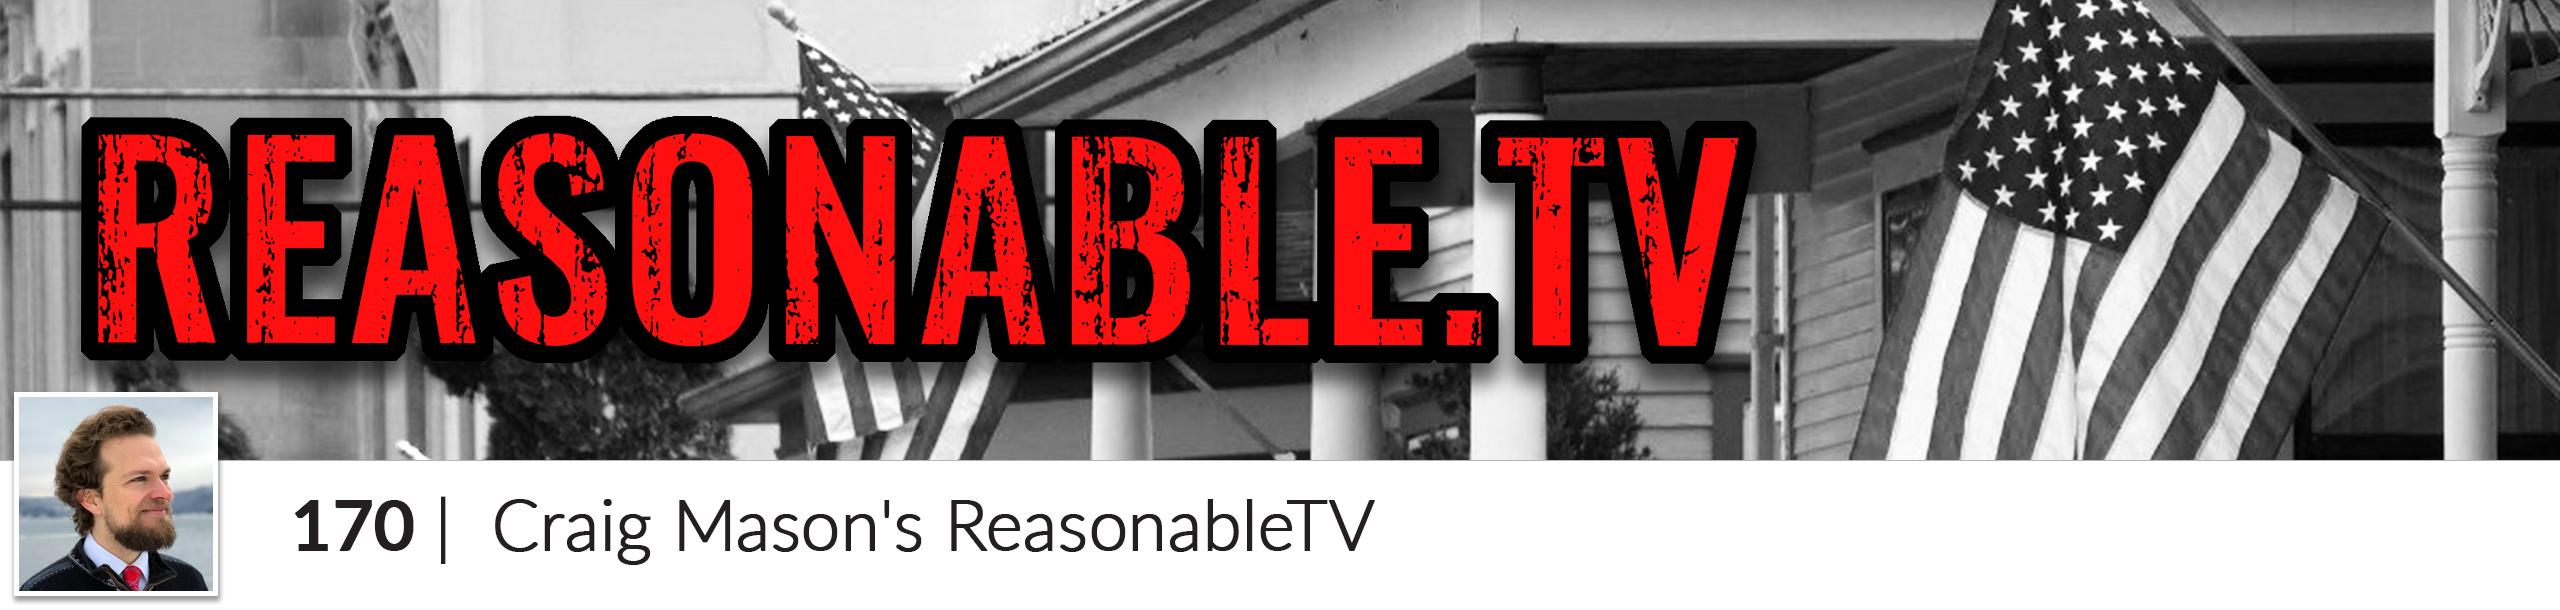 reasonableTV_header1